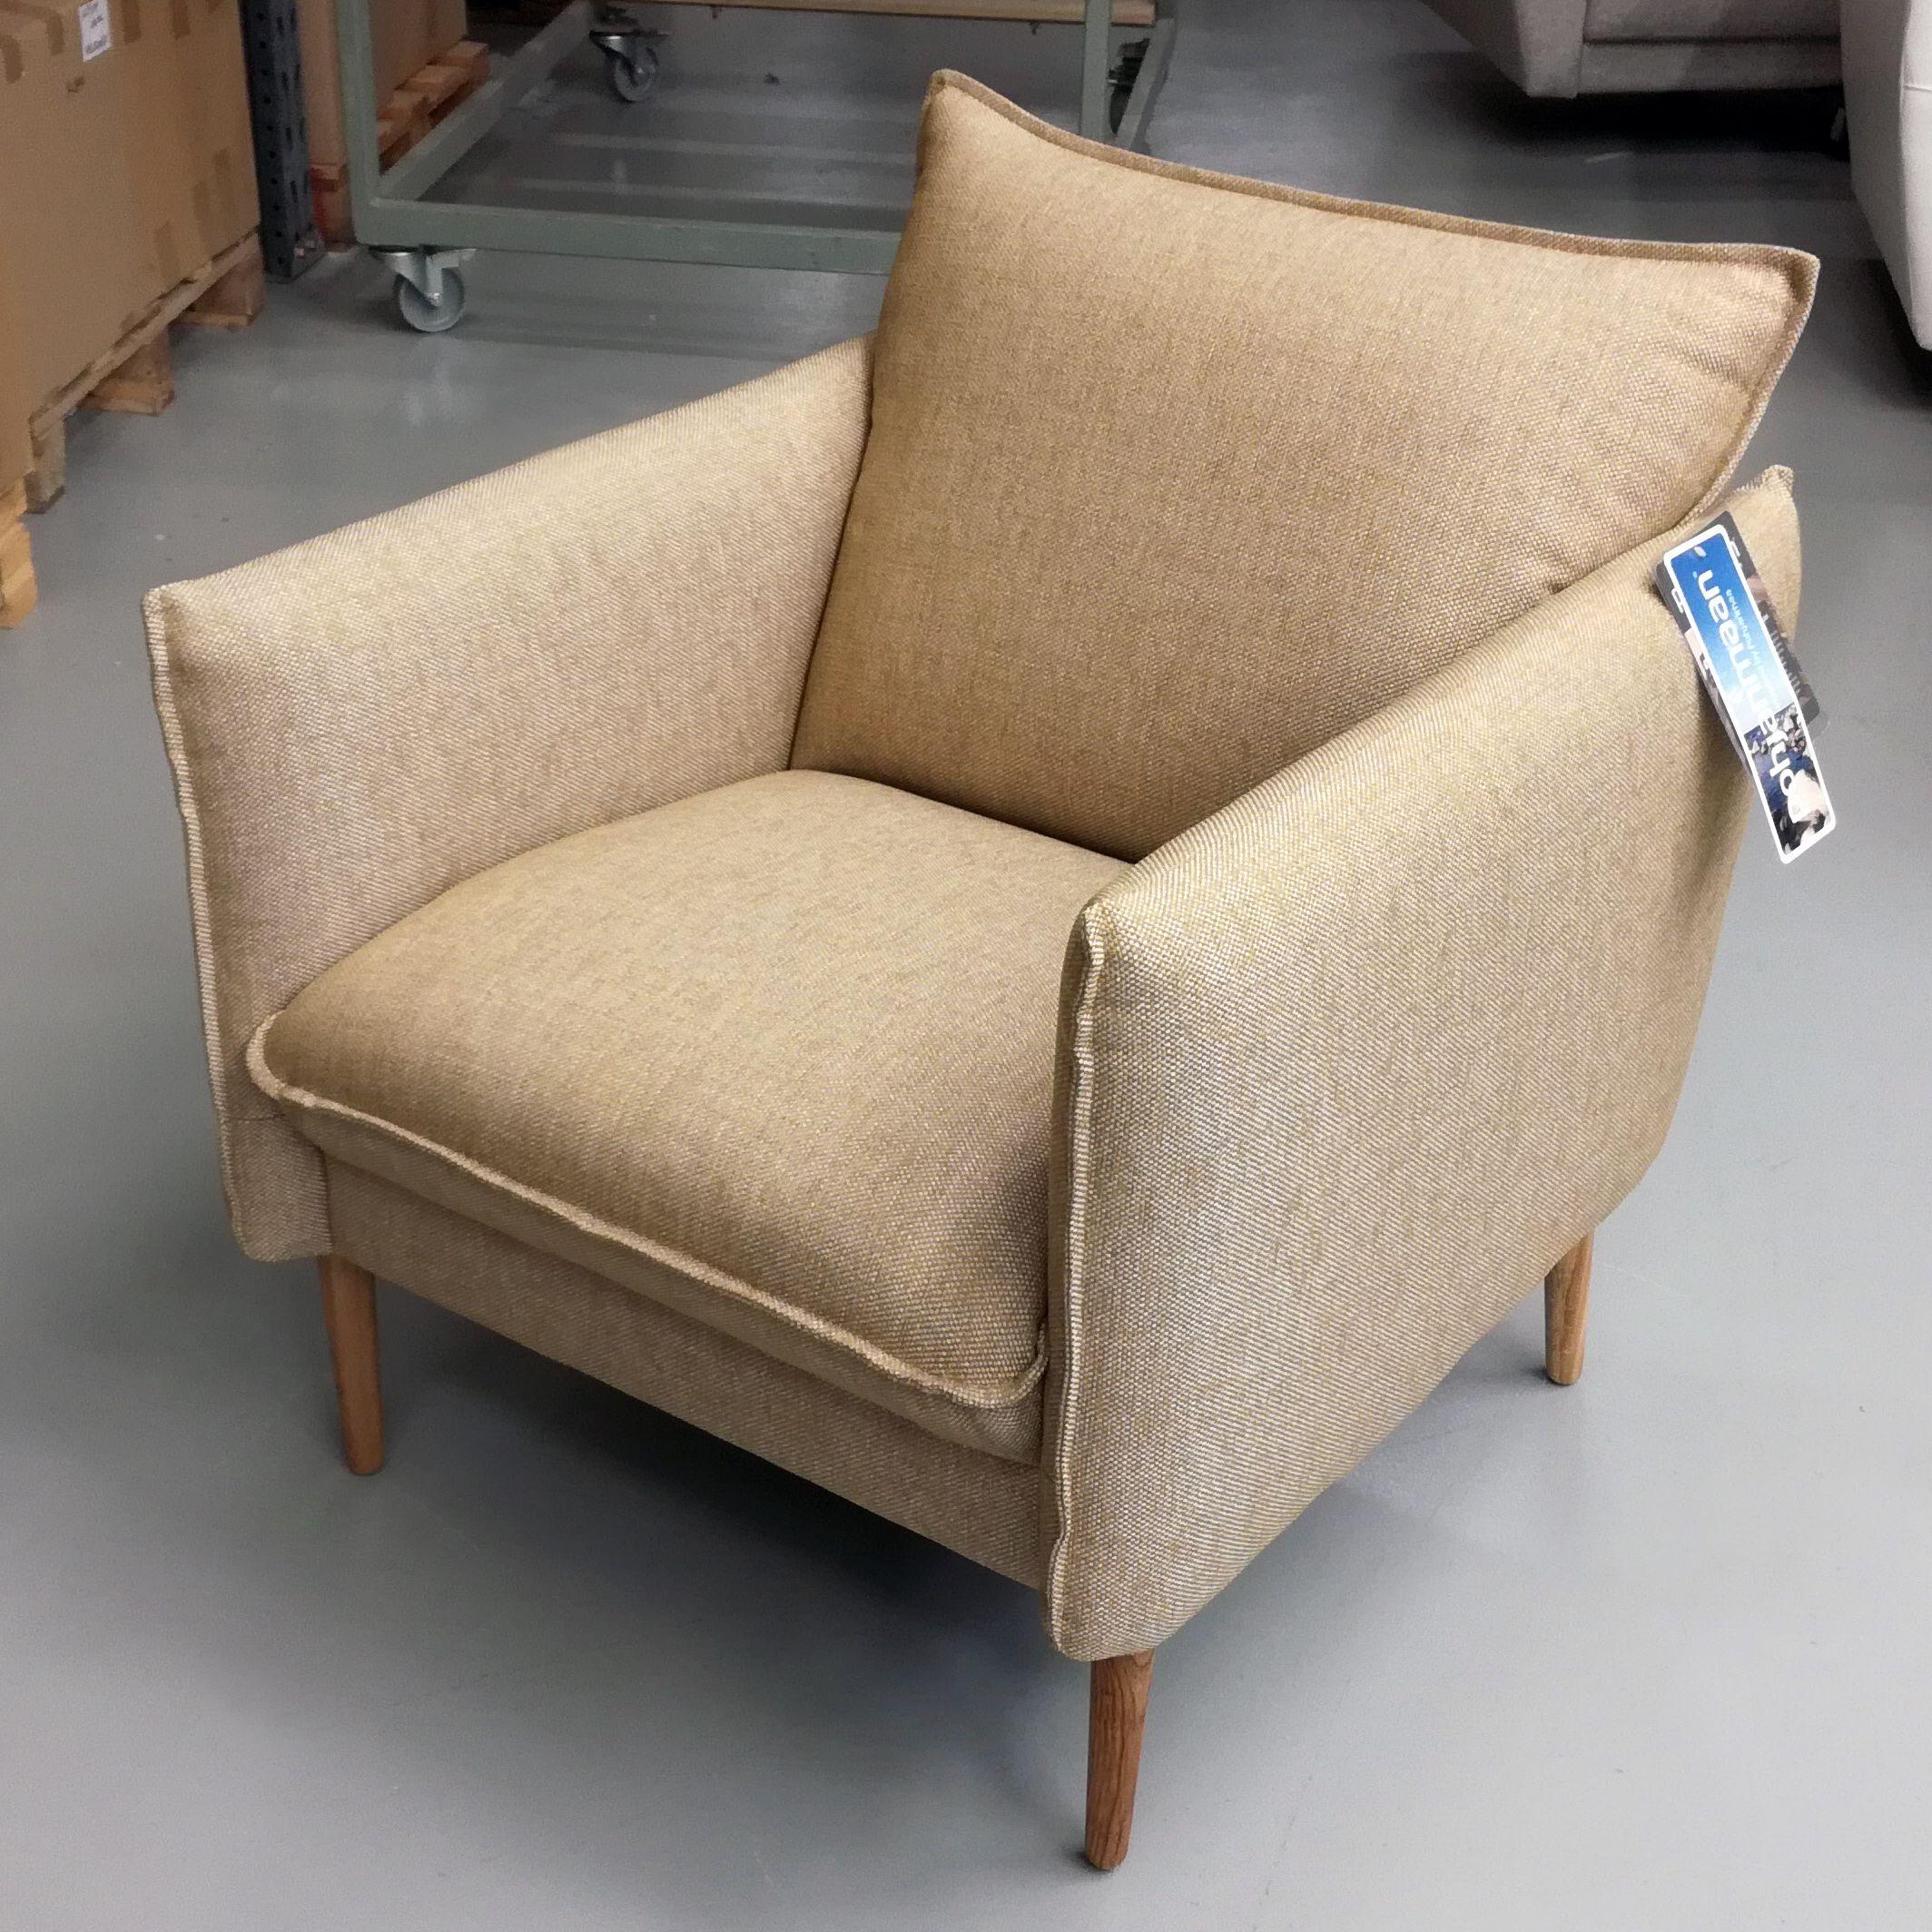 Chair Of The Day Malli Model Chic Kangas Fabric Diamonds 282